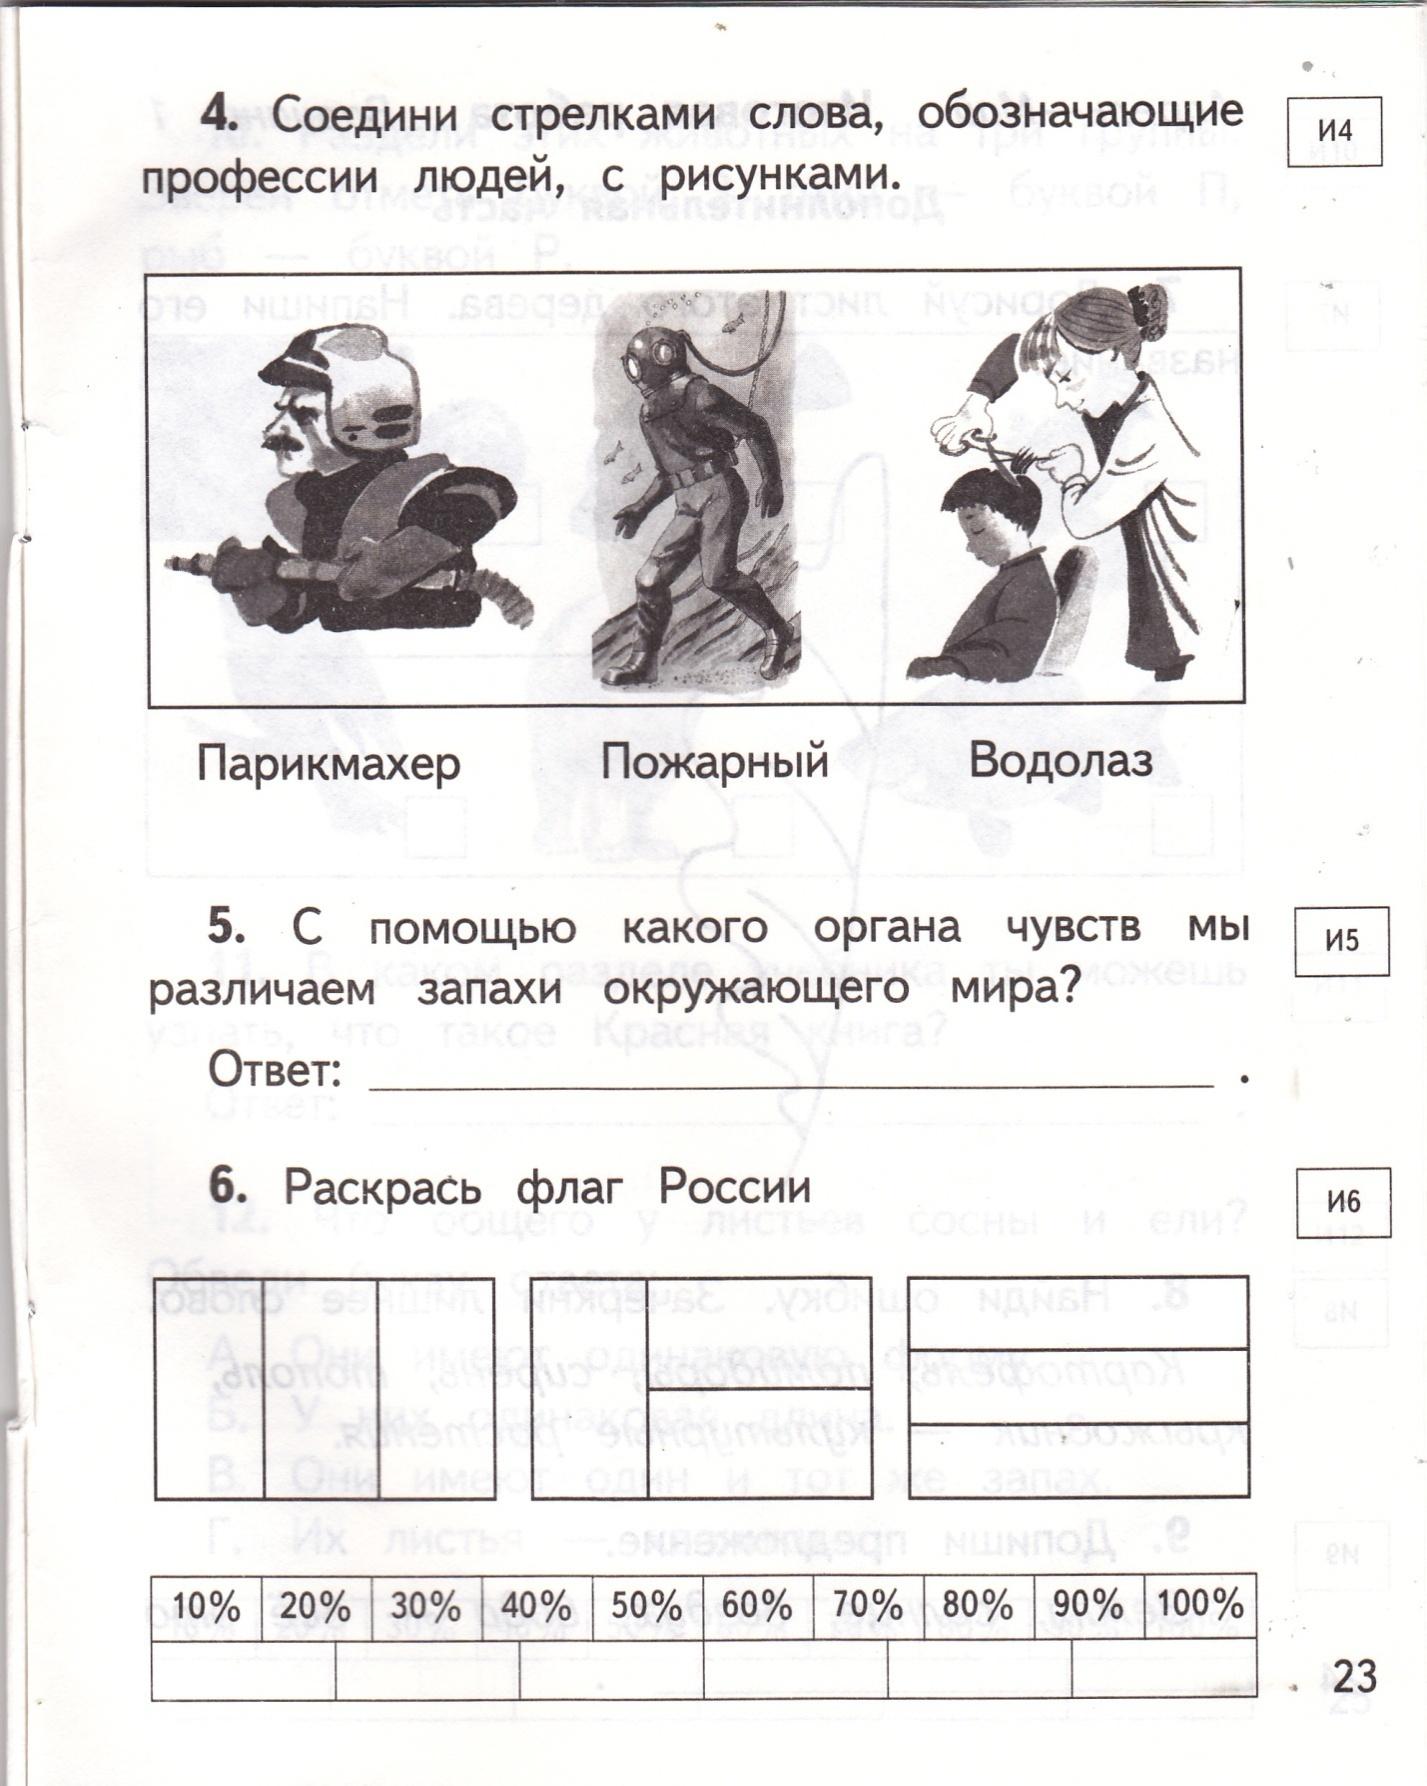 C:\Users\МБОУ СОШ № 4\Desktop\для Жуковой С.Н\IMG_0033.jpg